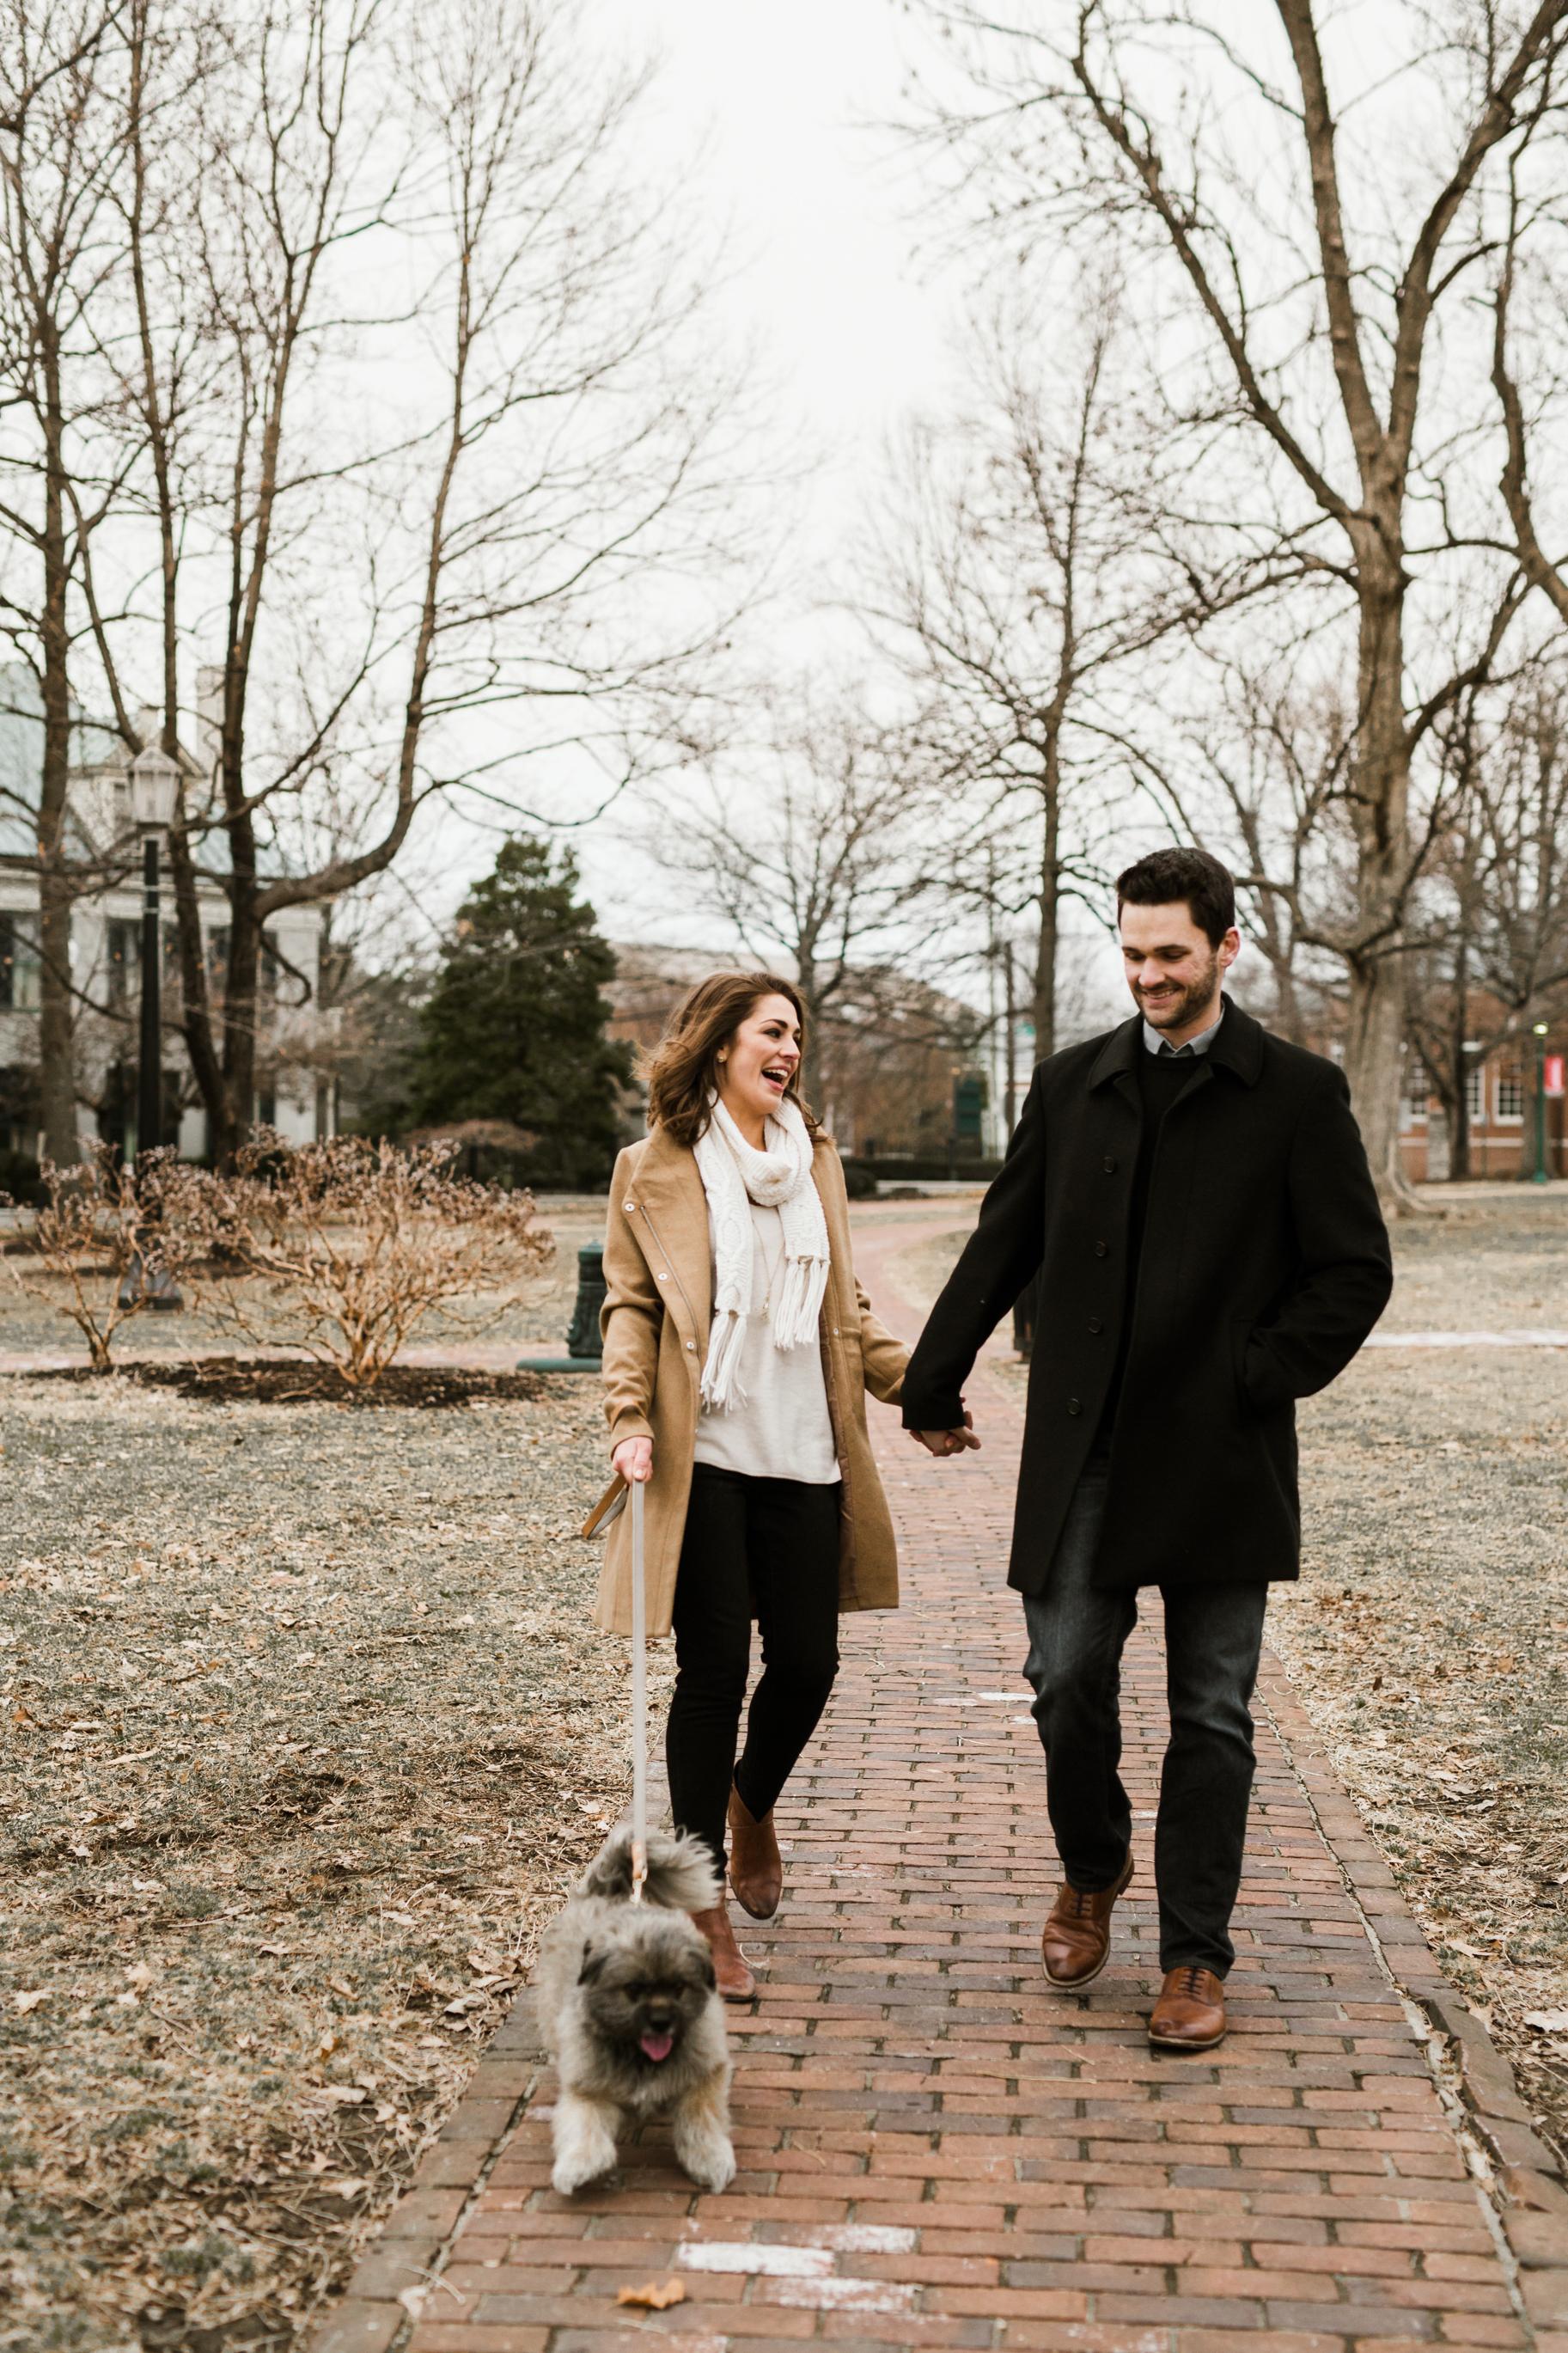 Ellen & Lee Engagement 2018 WEBSITE SP Crystal Ludwick Photo (32 of 54).jpg